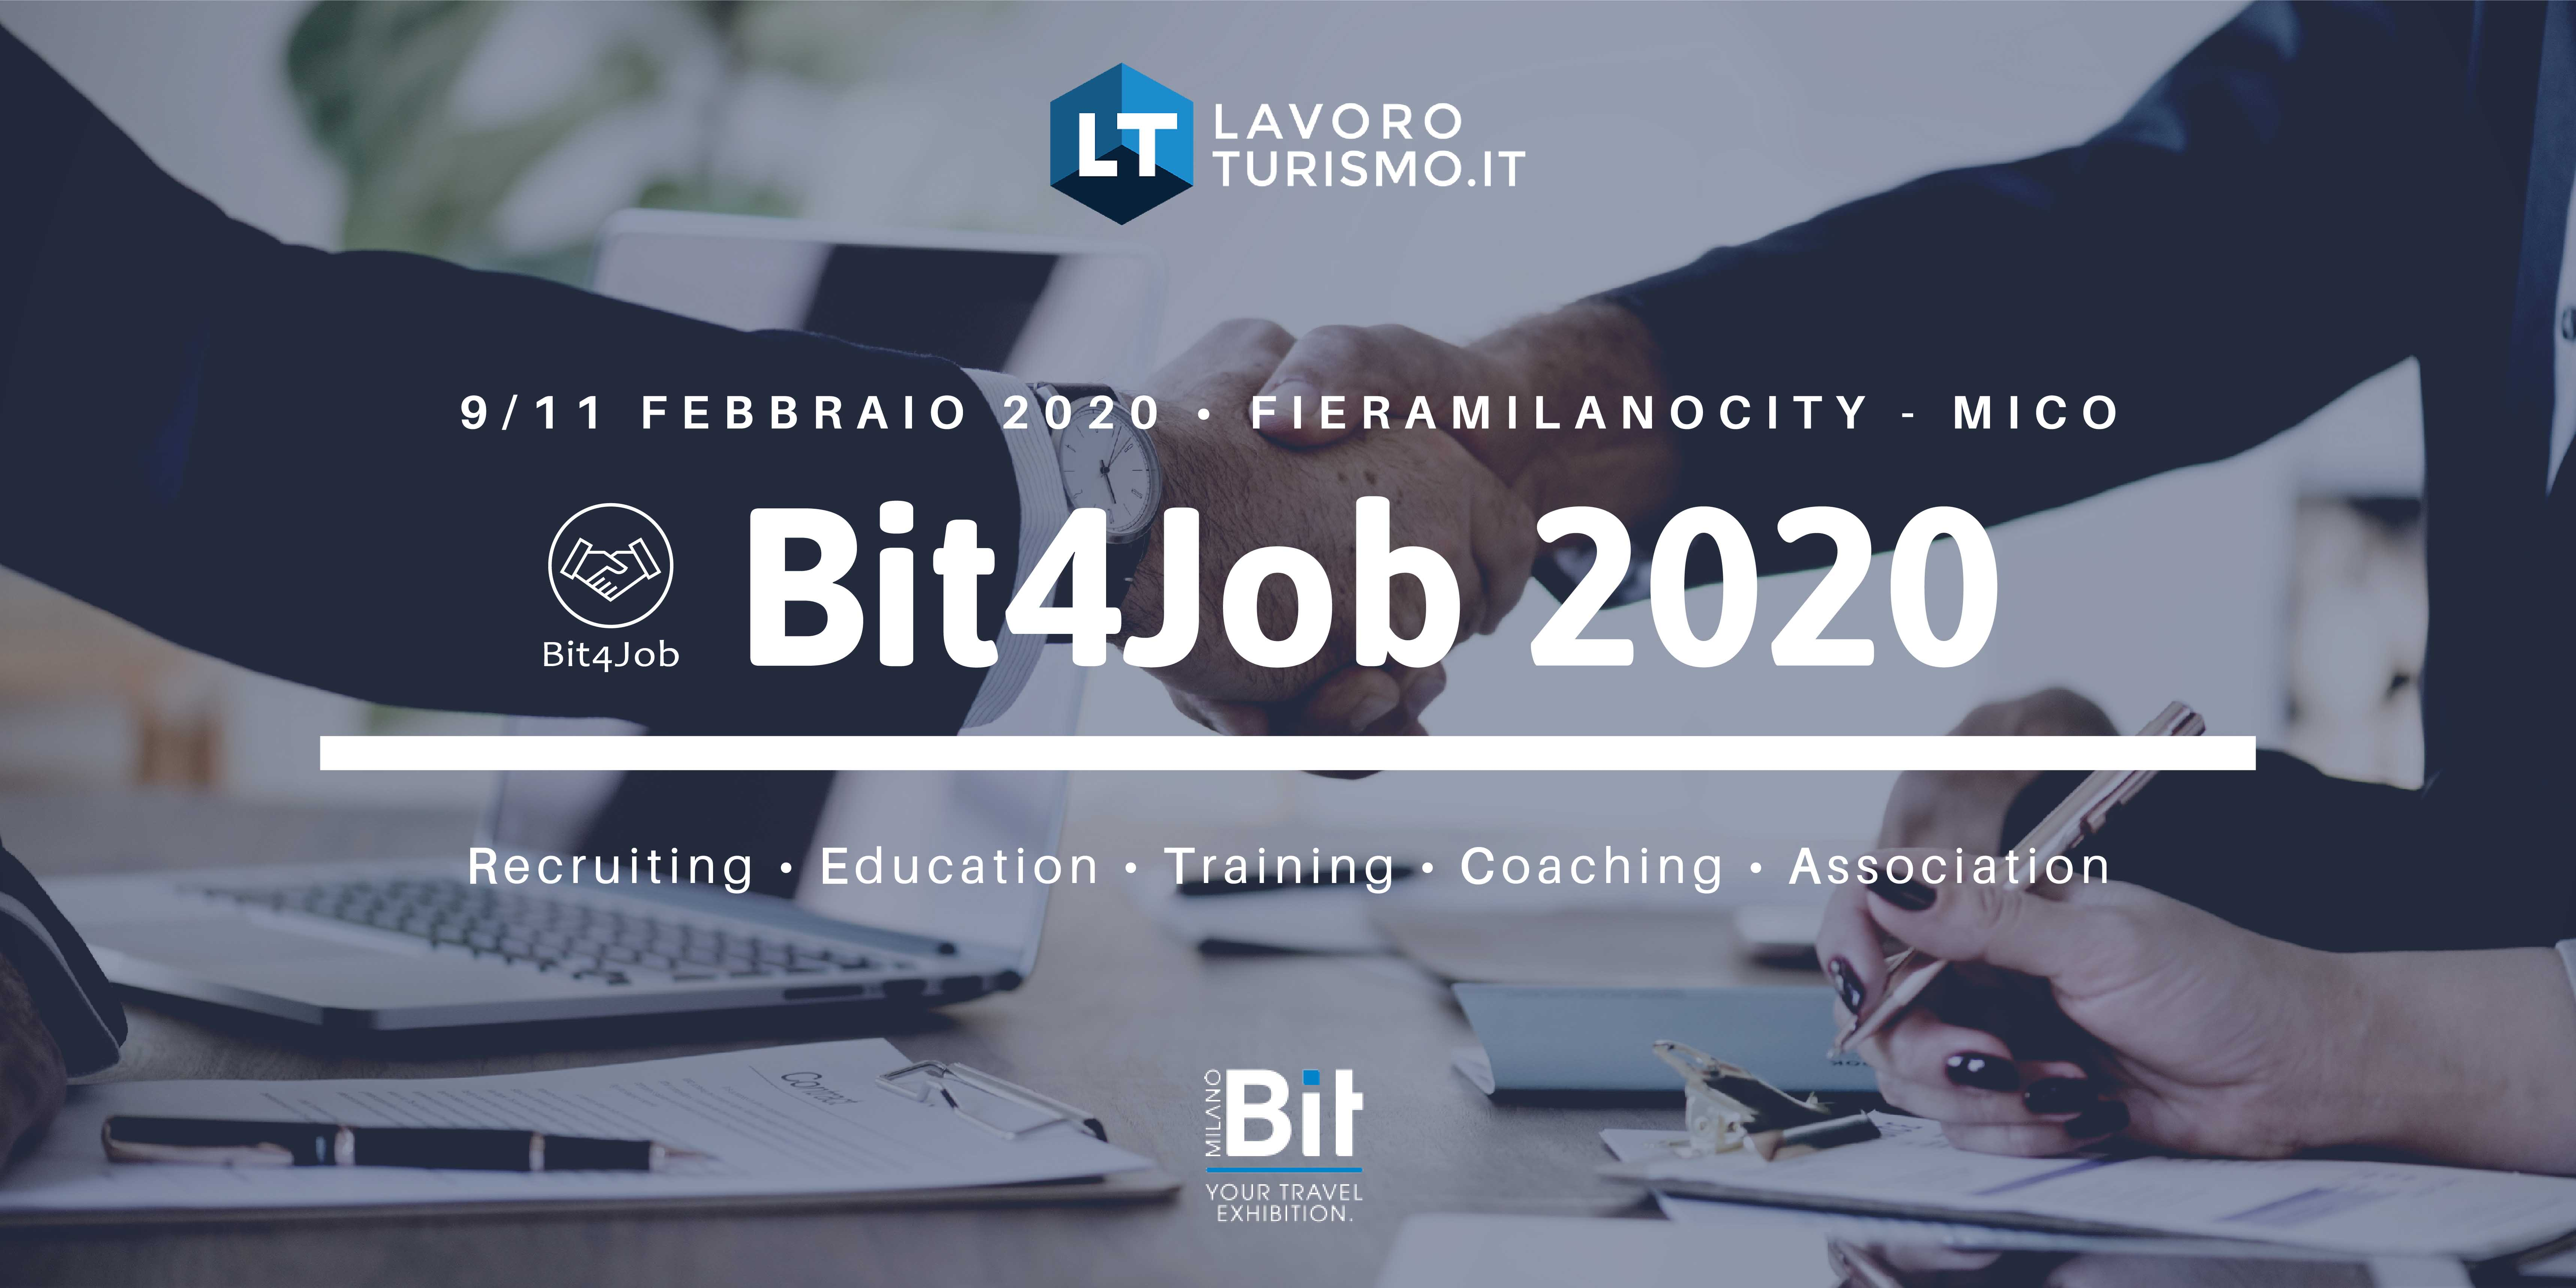 Bit4Job 2020